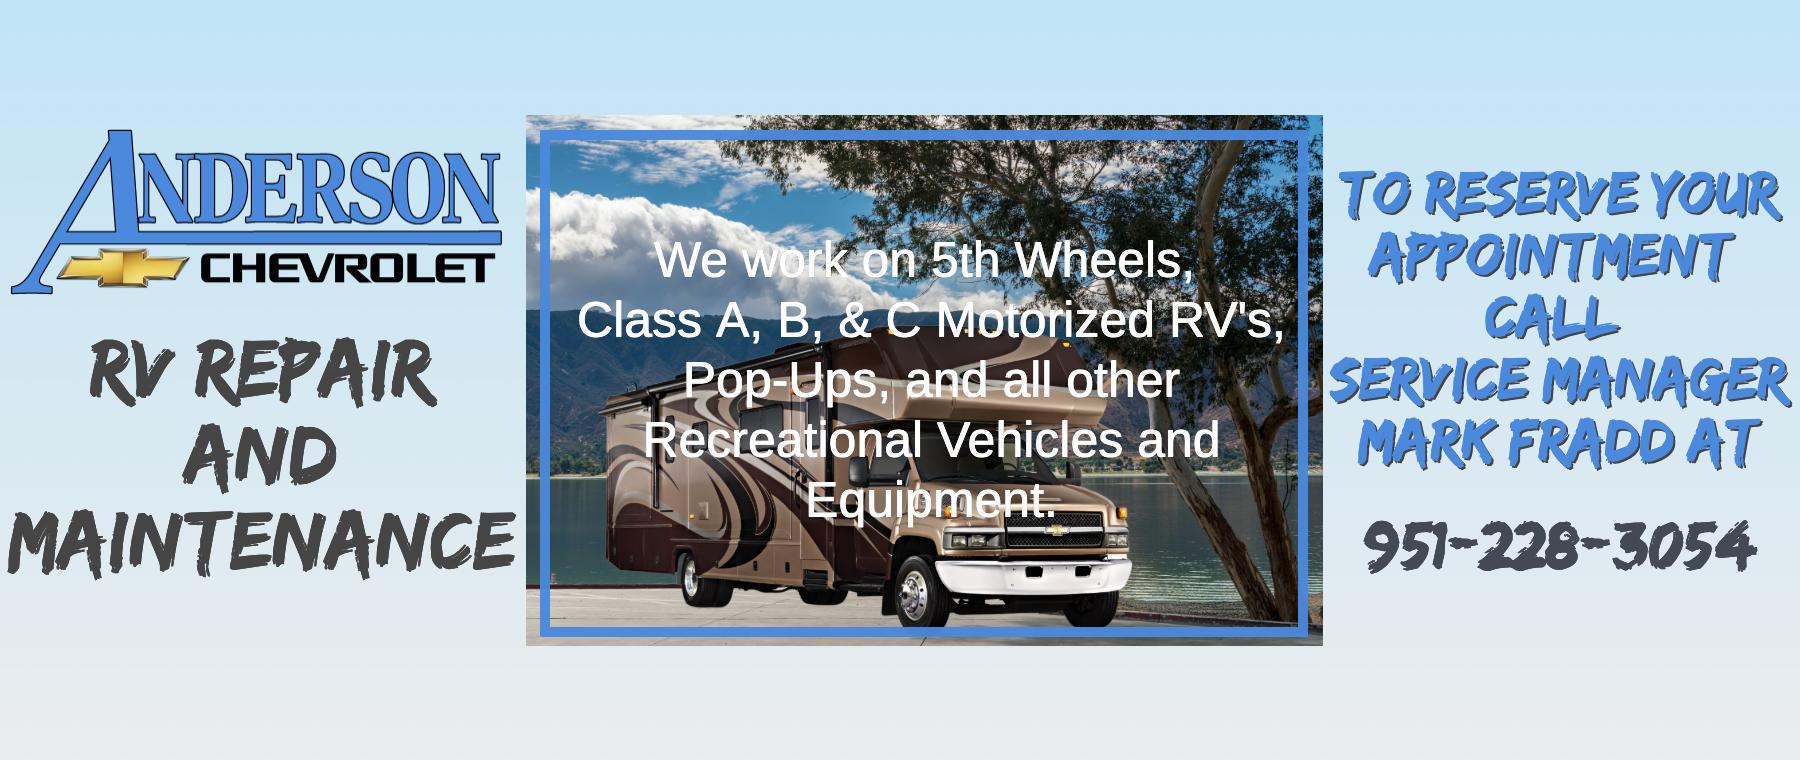 Anderson Chevy RV Service & Repair